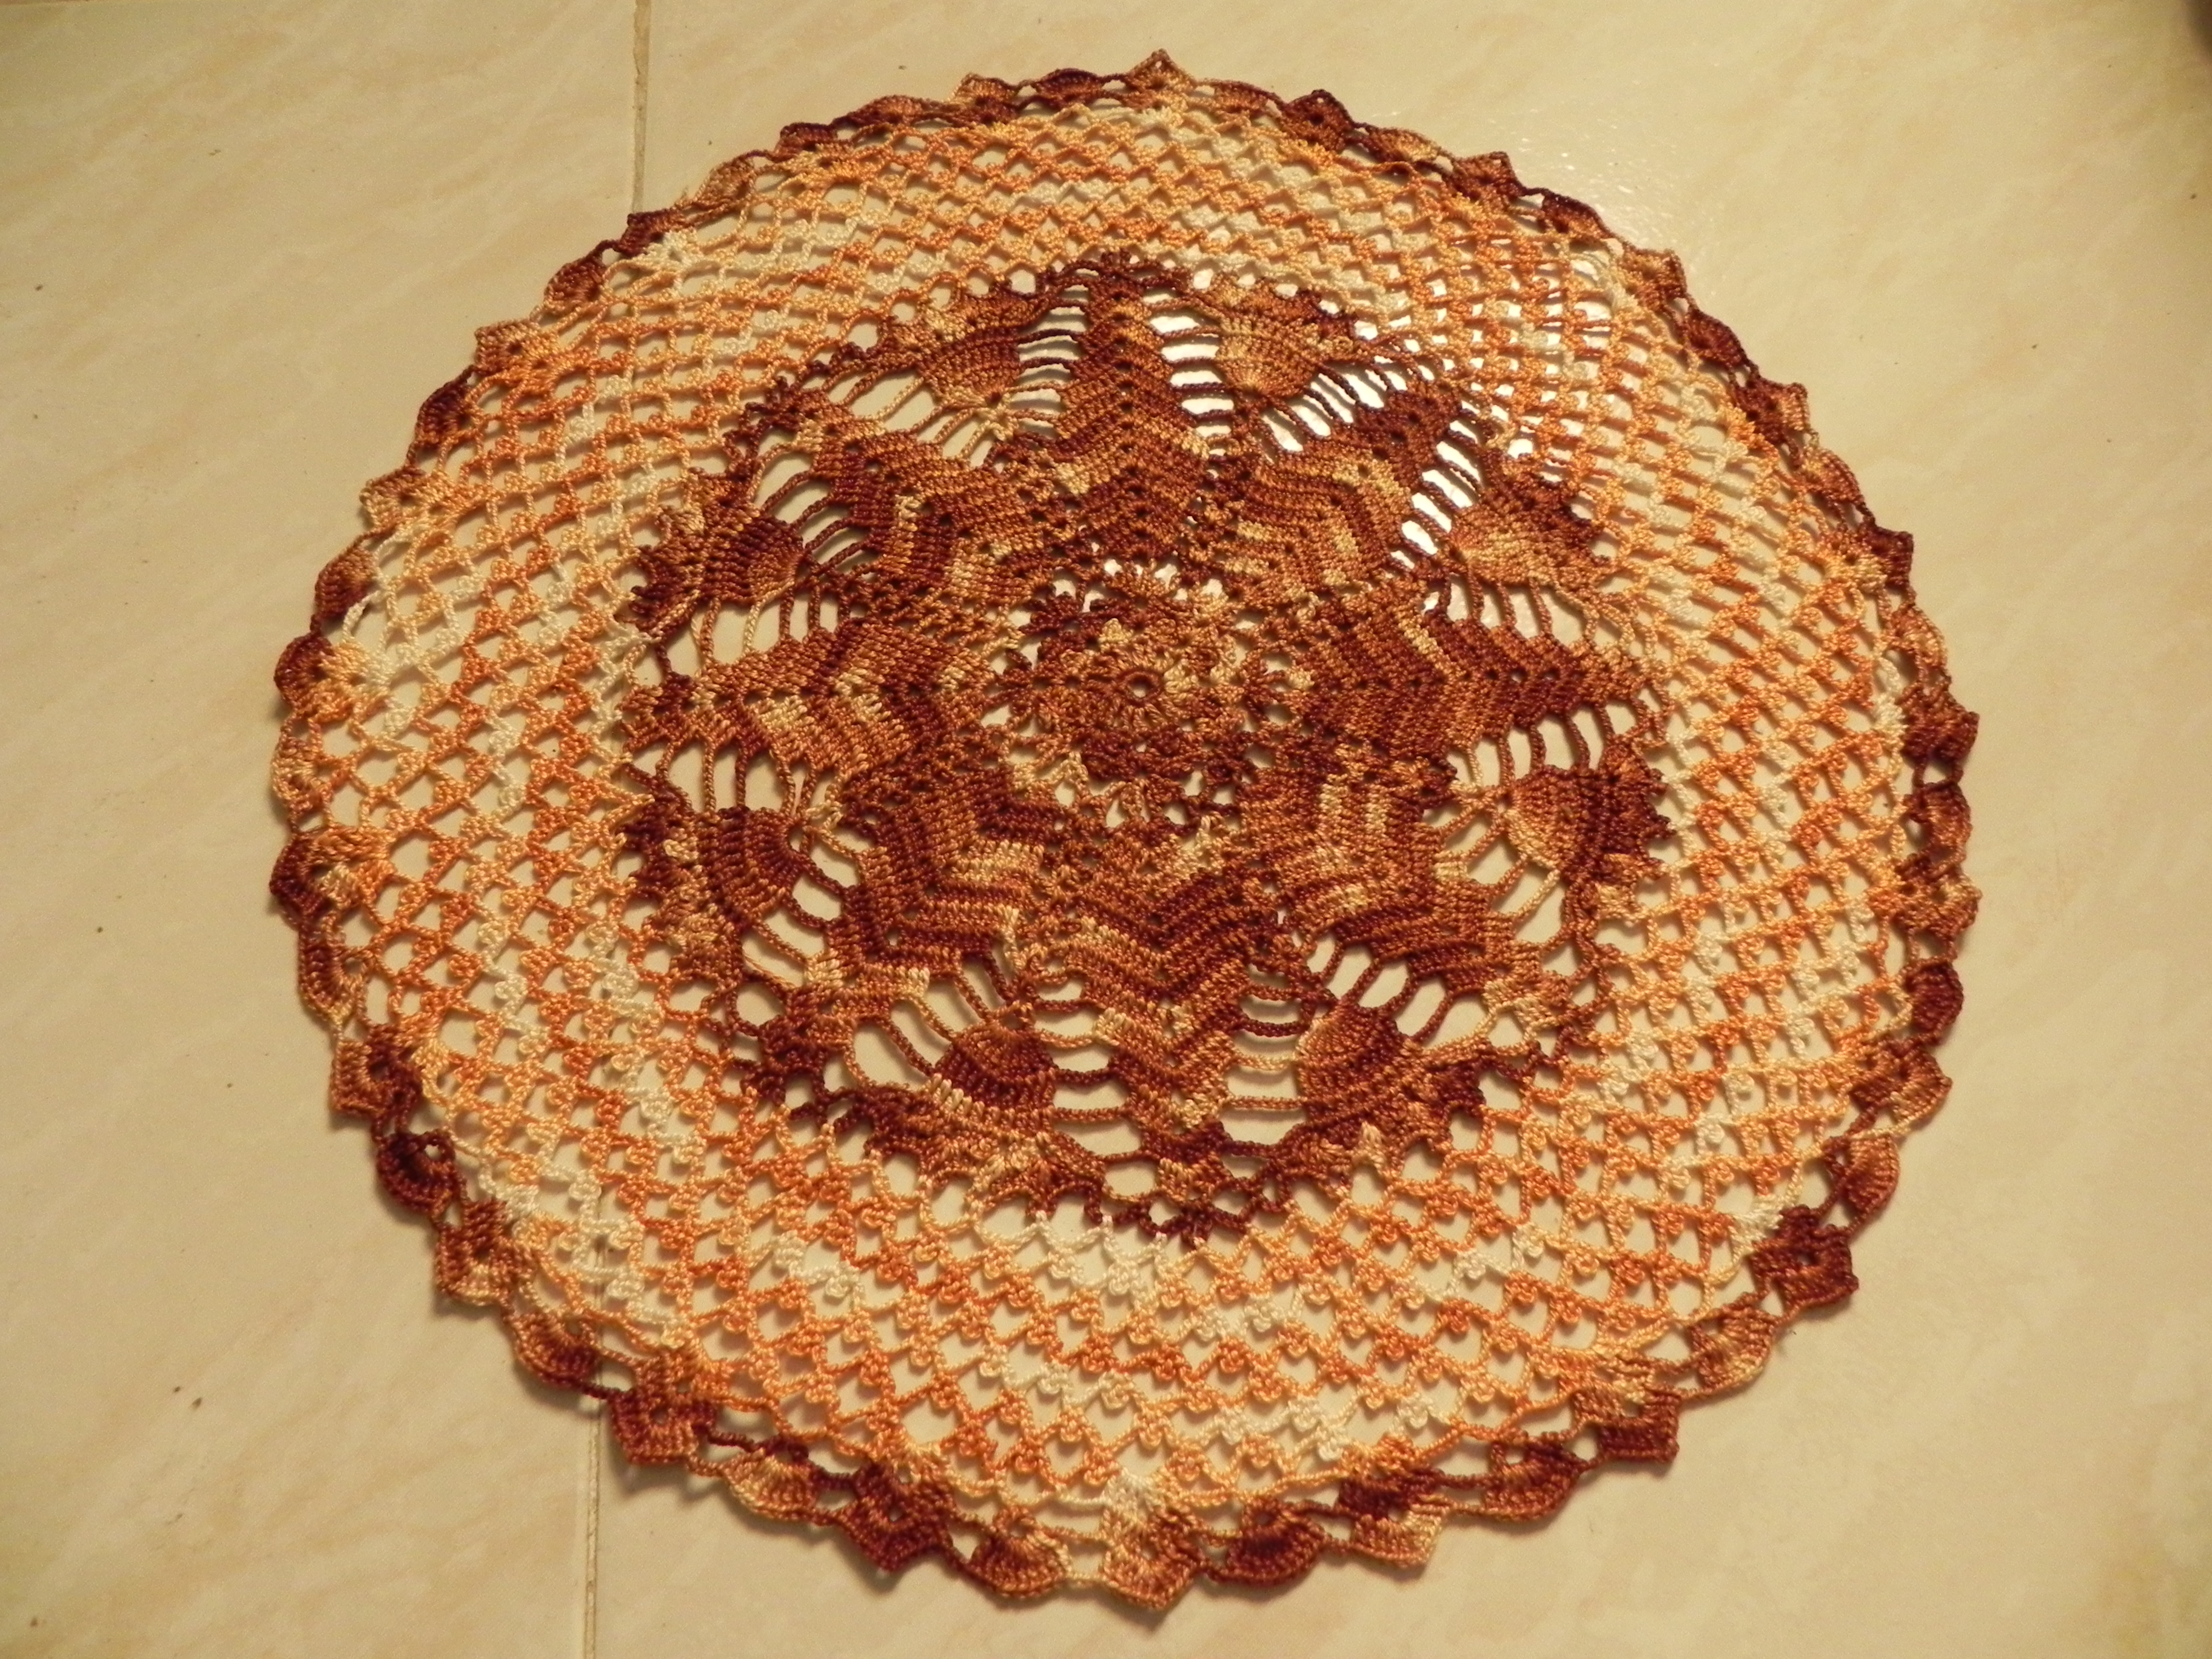 Tapetes de ganchillo crochet tijeras y cuchara for Tapetes de ganchillo